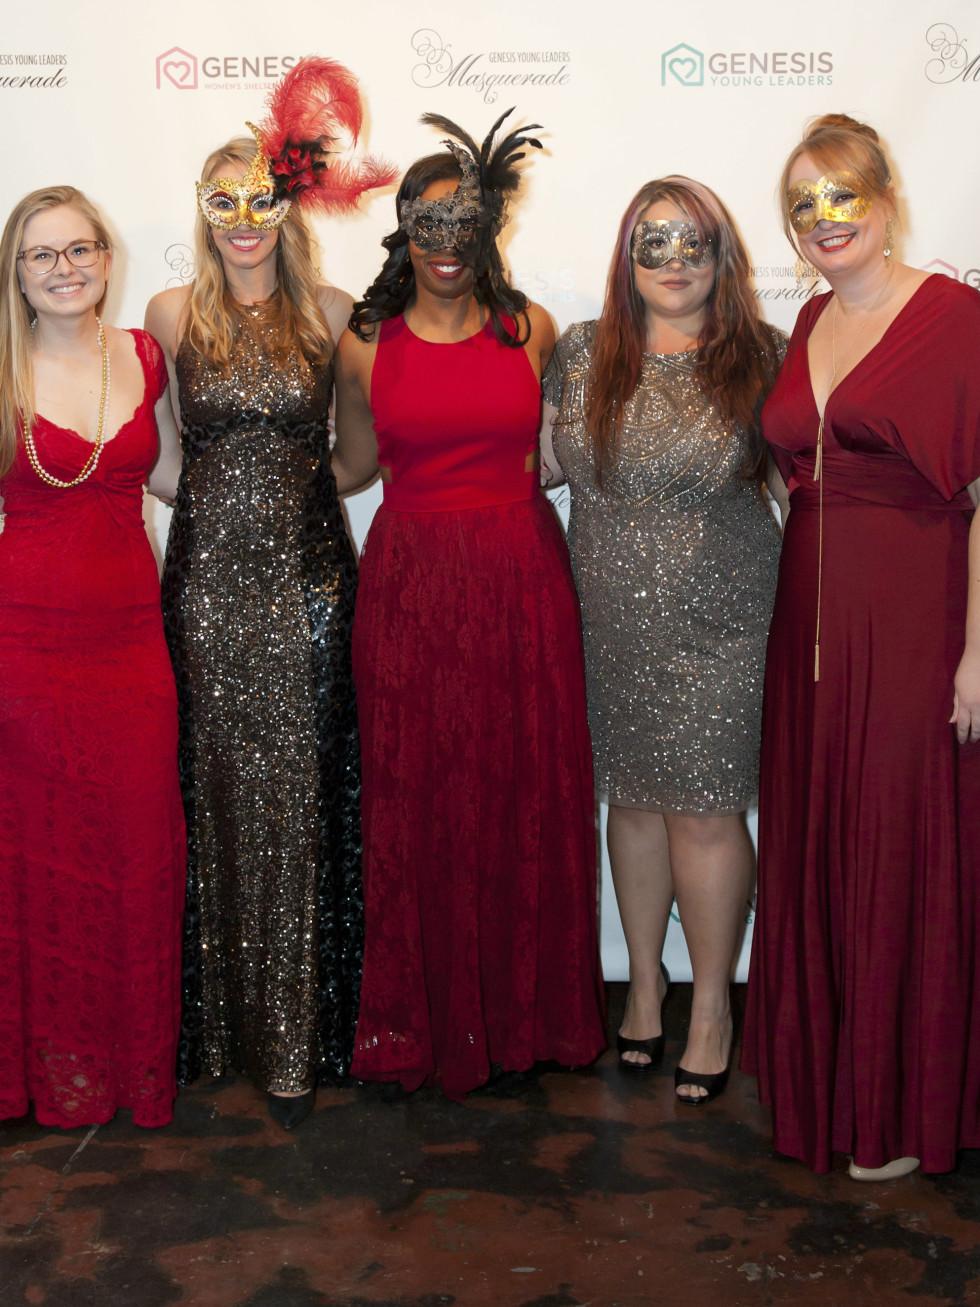 Kate Schlinke, Sarah Foster, Christina Walker, Jessica Medina, Brooke Meyer